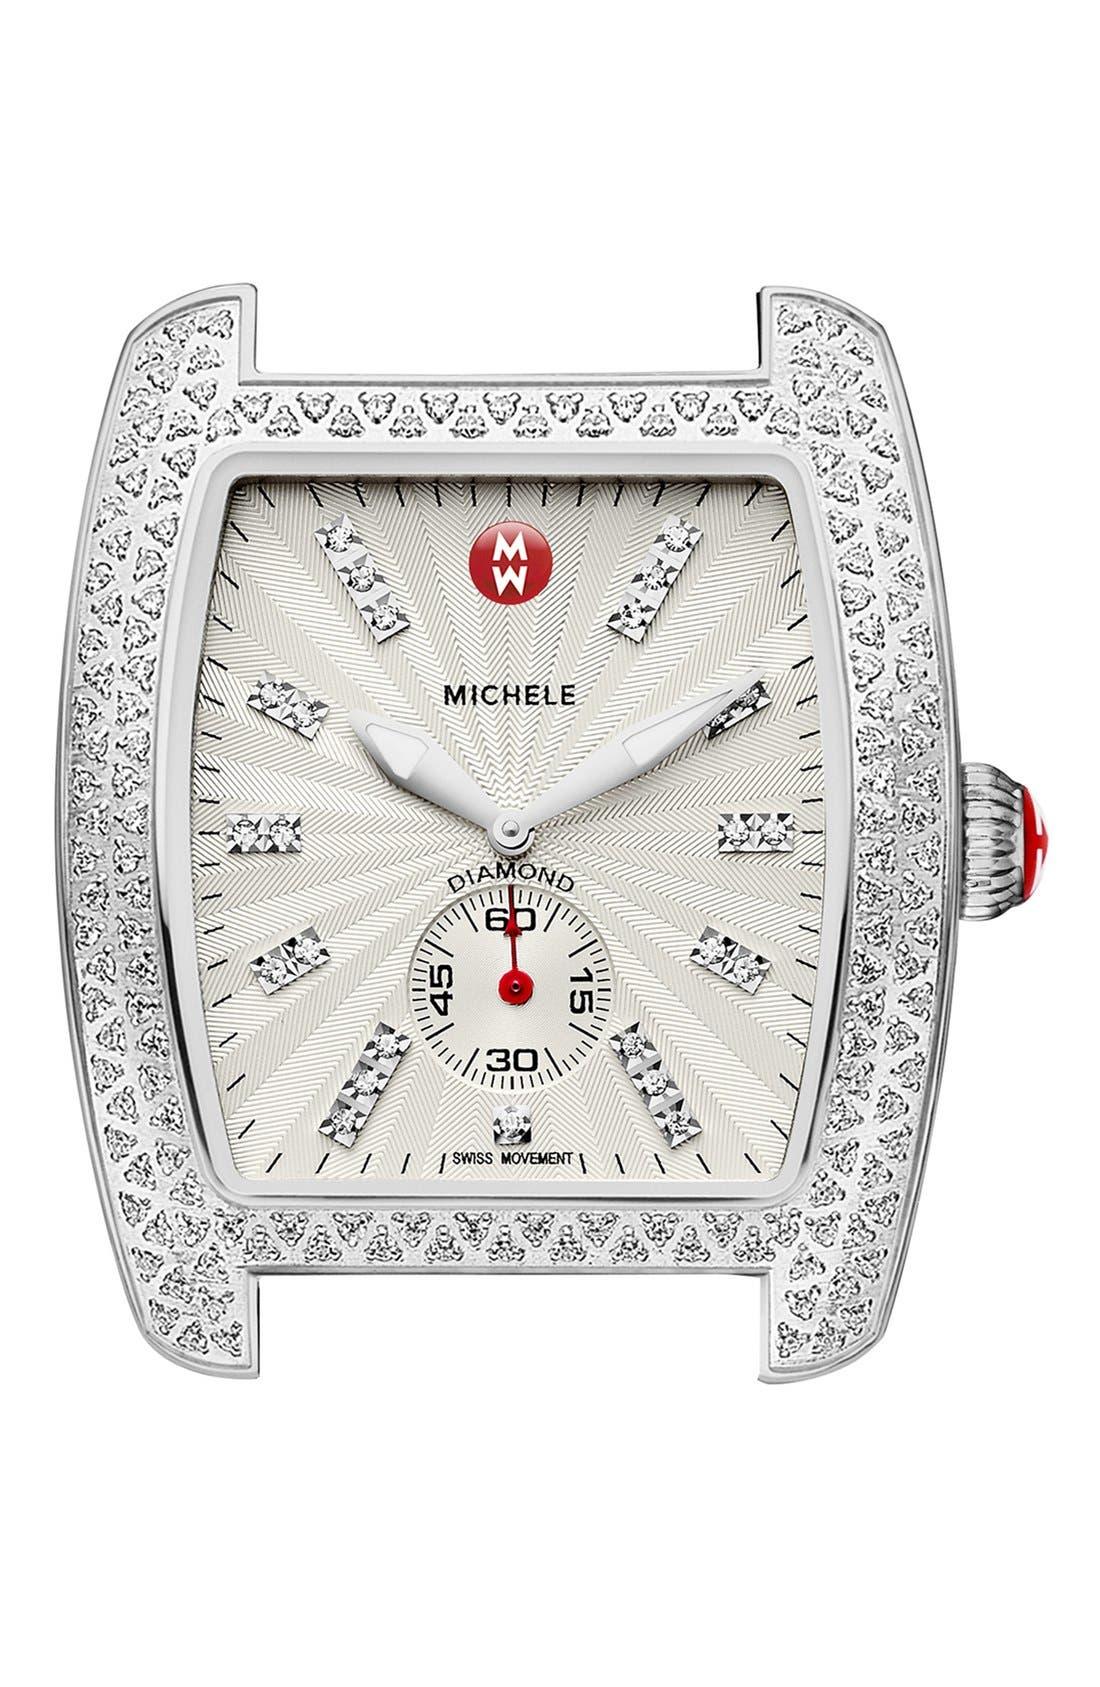 Main Image - MICHELE 'Urban Diamond' Diamond Dial Watch Case, 36mm x 37mm